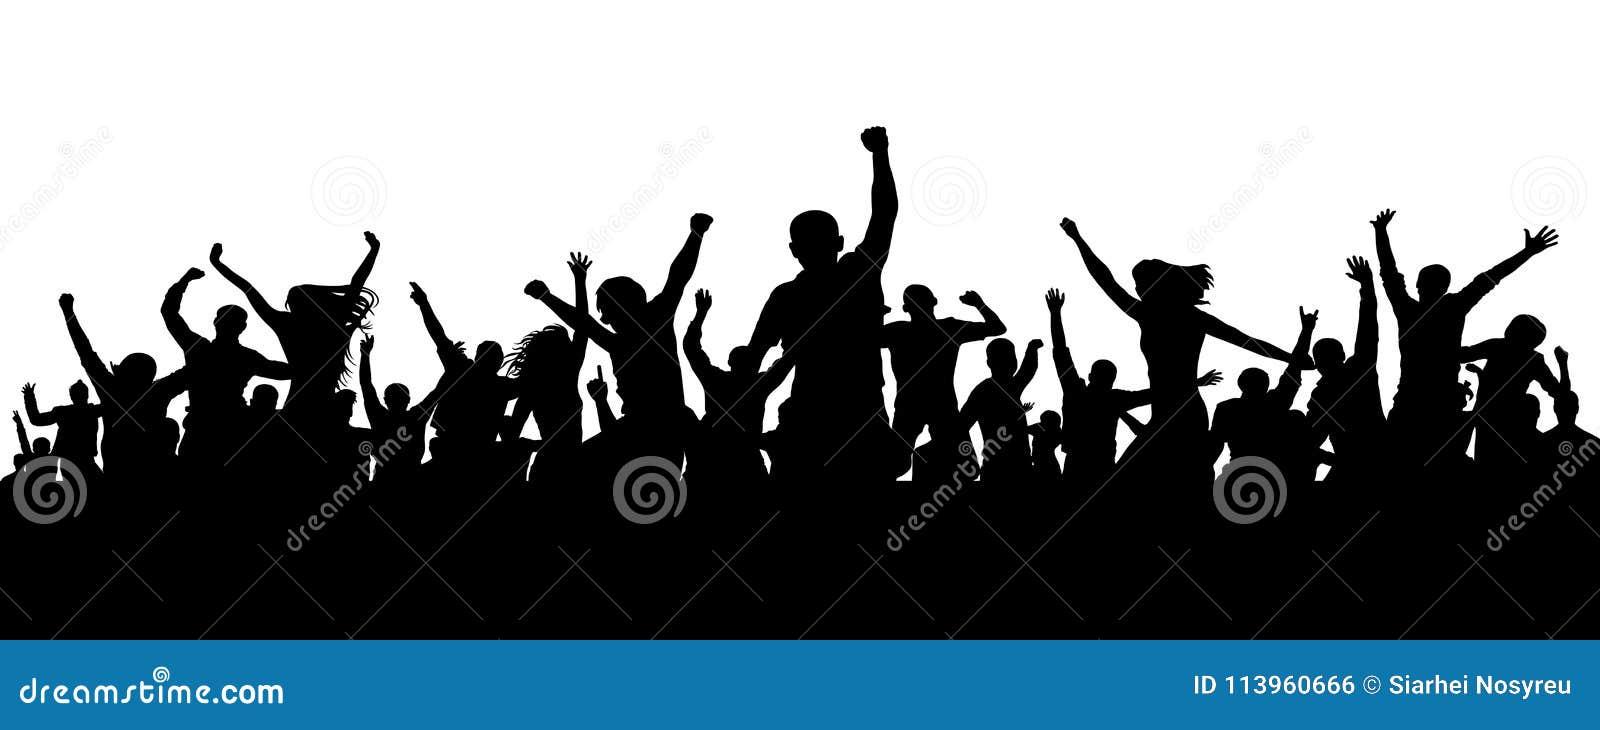 Multitud De Gente Silueta: Multitud Alegre Silueta Alegre De La Gente De La